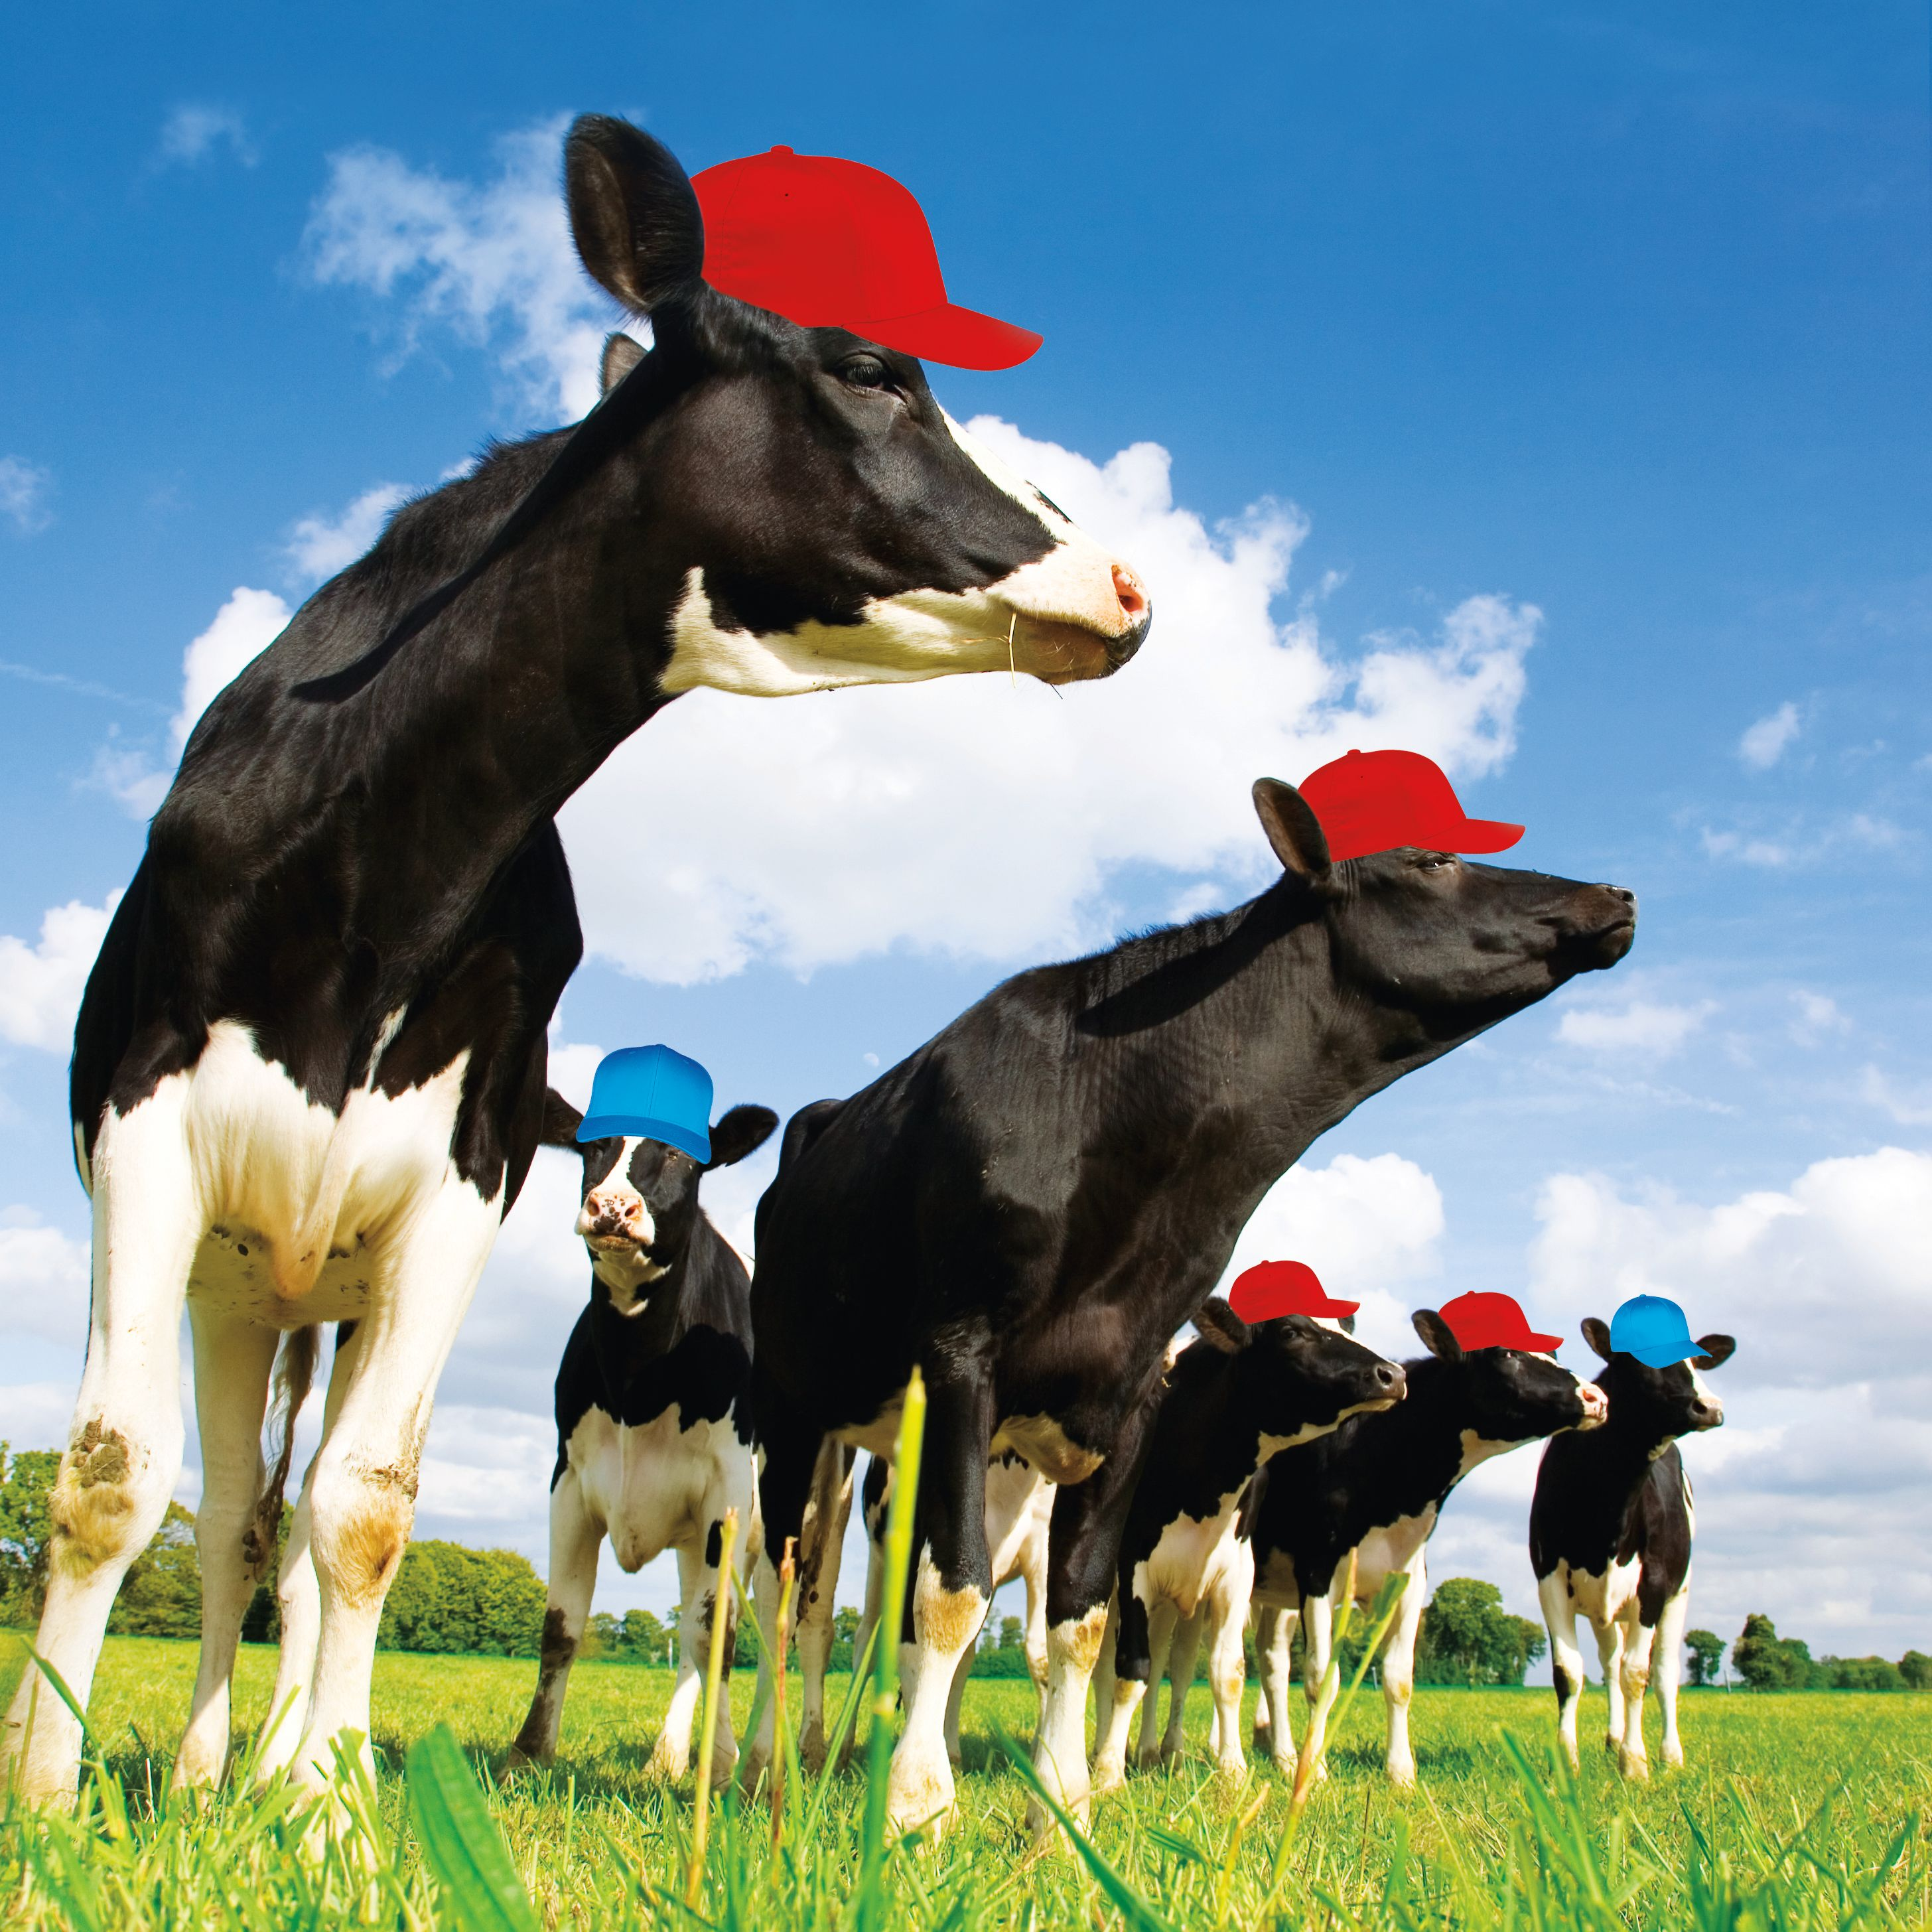 Pomo 0217 tillamook dairy cows wearing hats vqfaeh